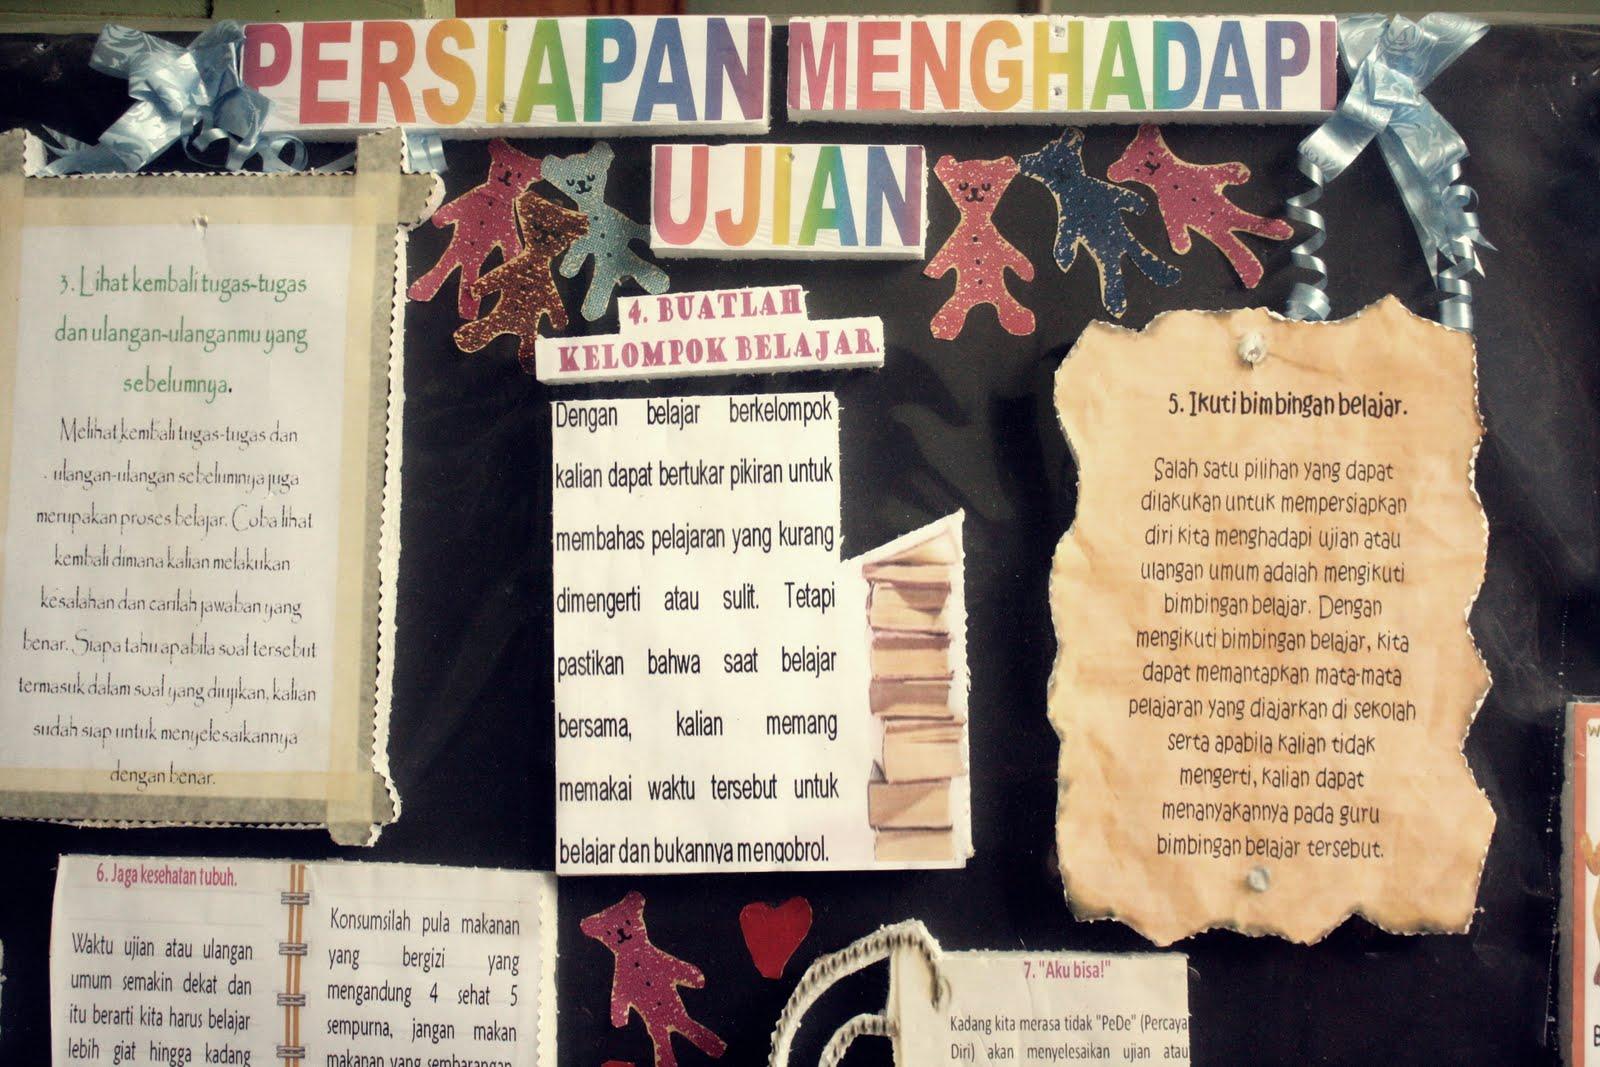 ... , Kumpulan judul contoh skripsi pendidikan contoh skripsi 2015 contoh